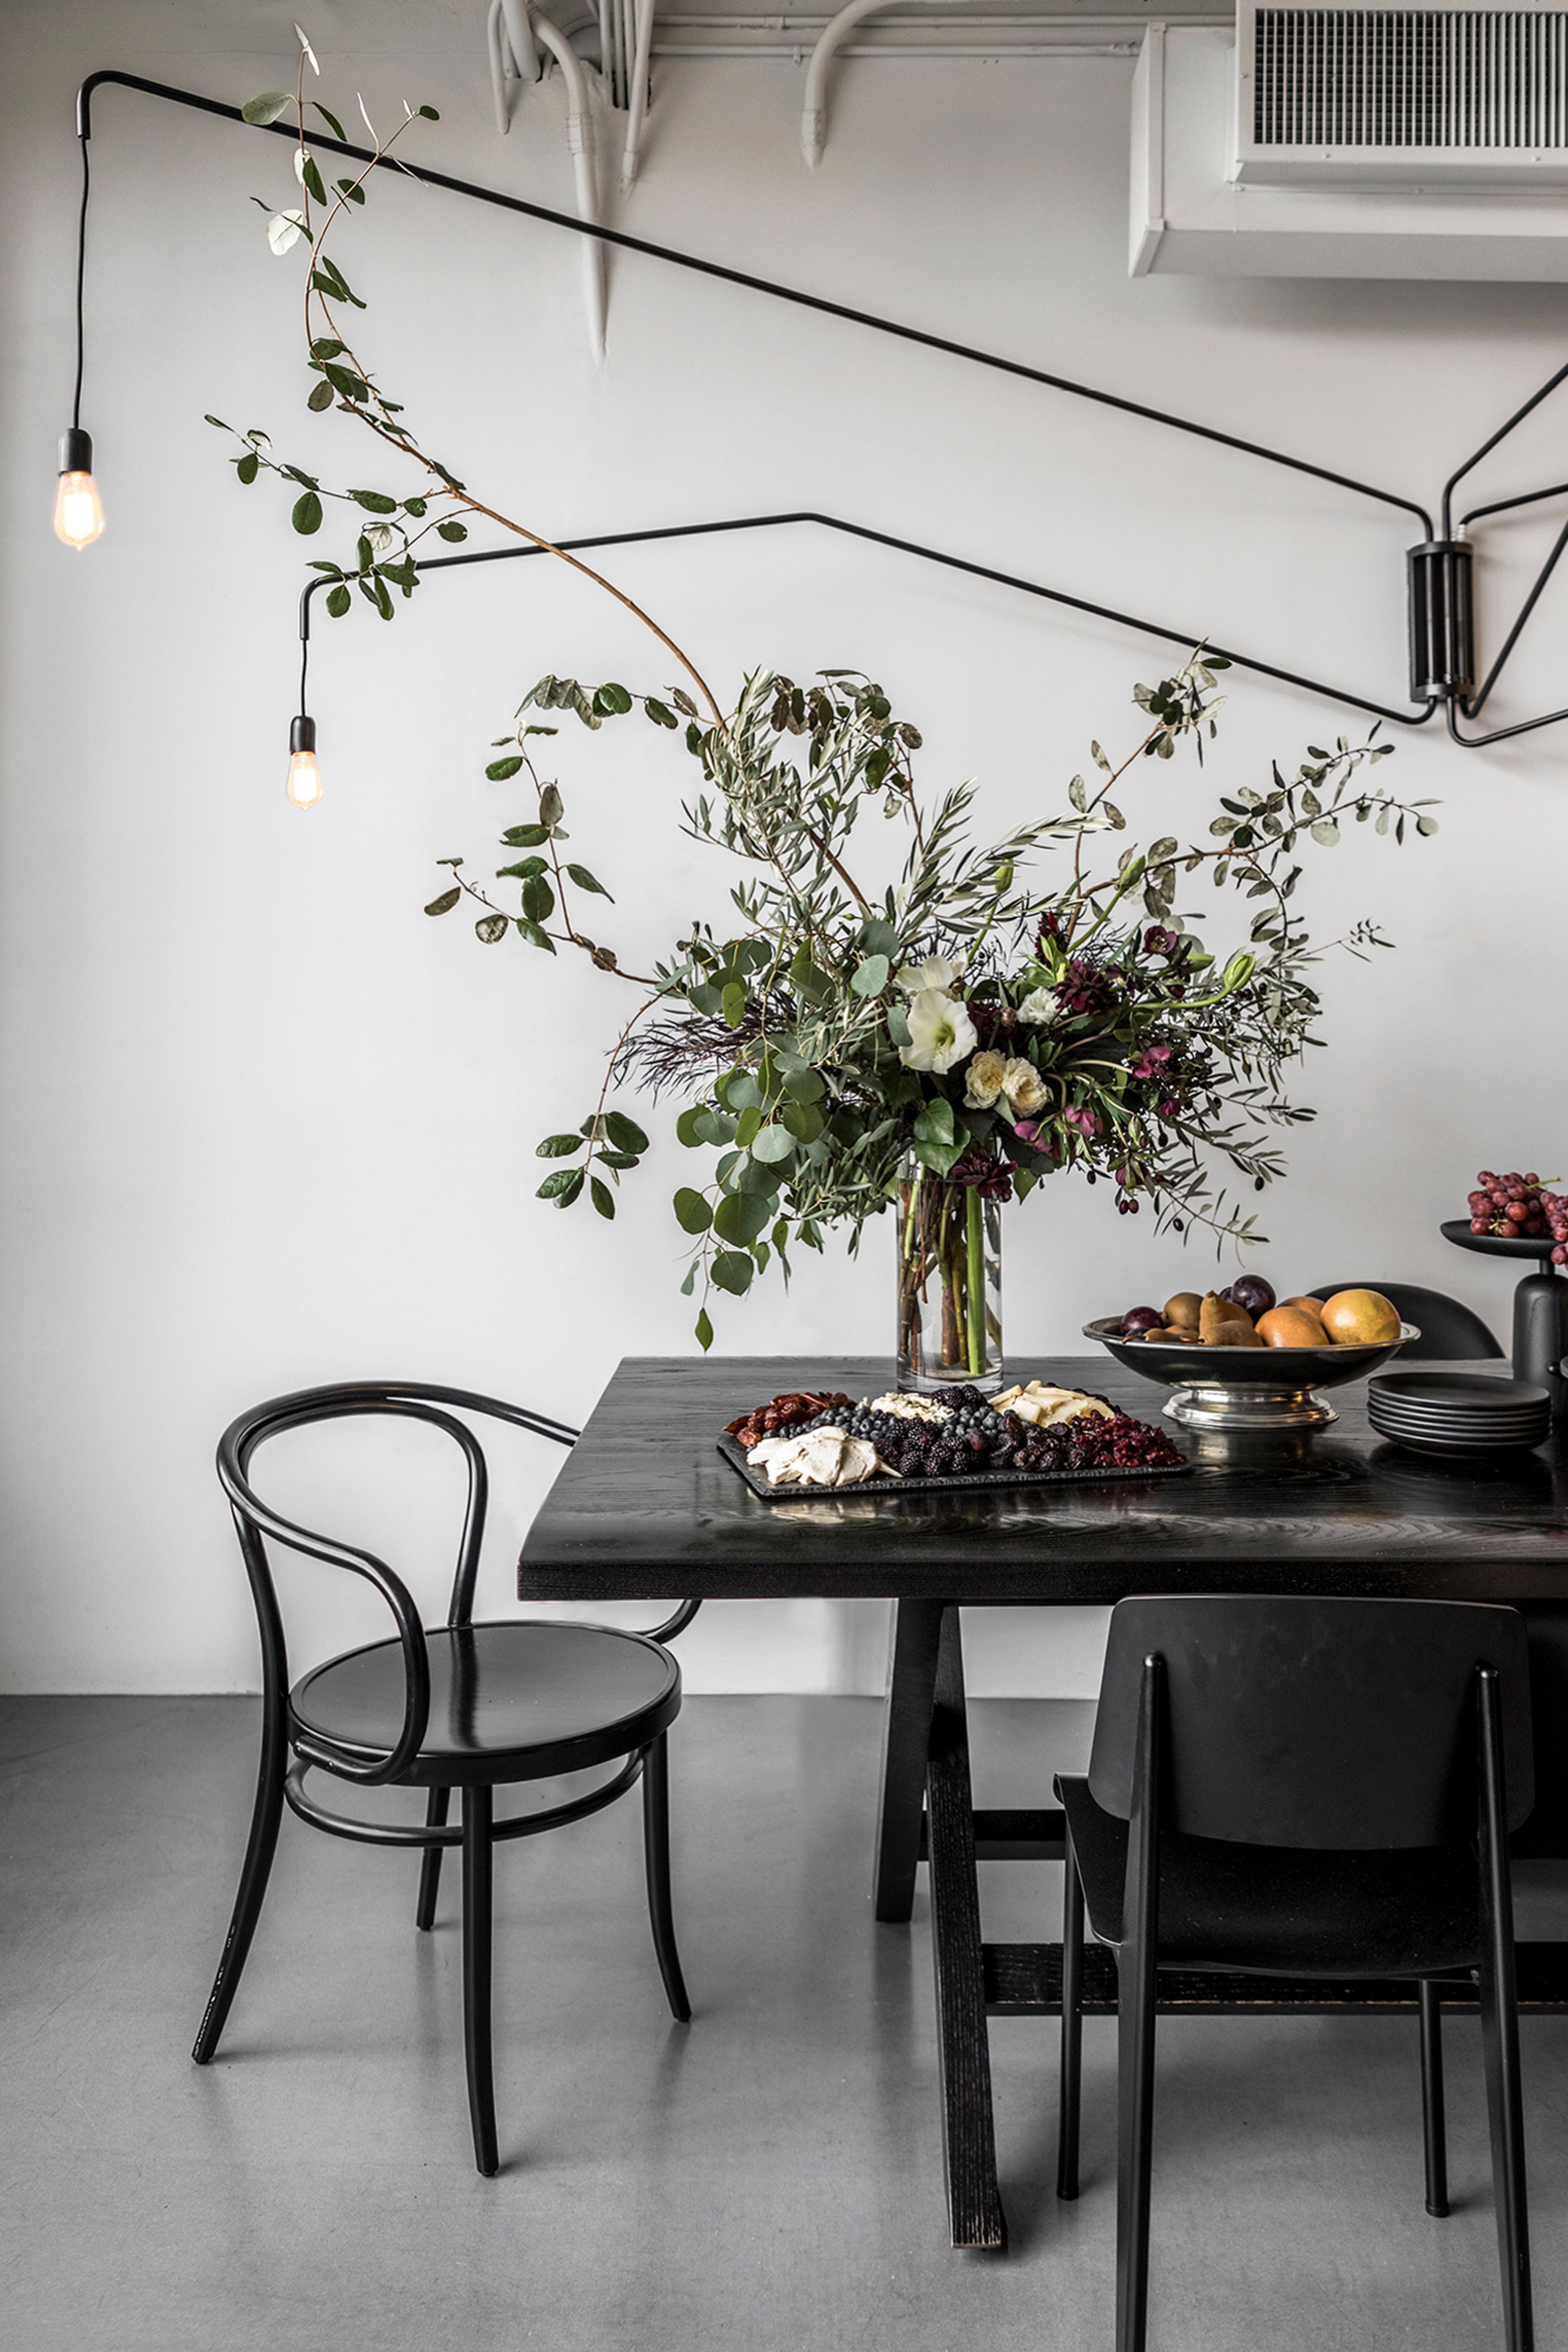 Self-designed office by Nicole Hollis studio